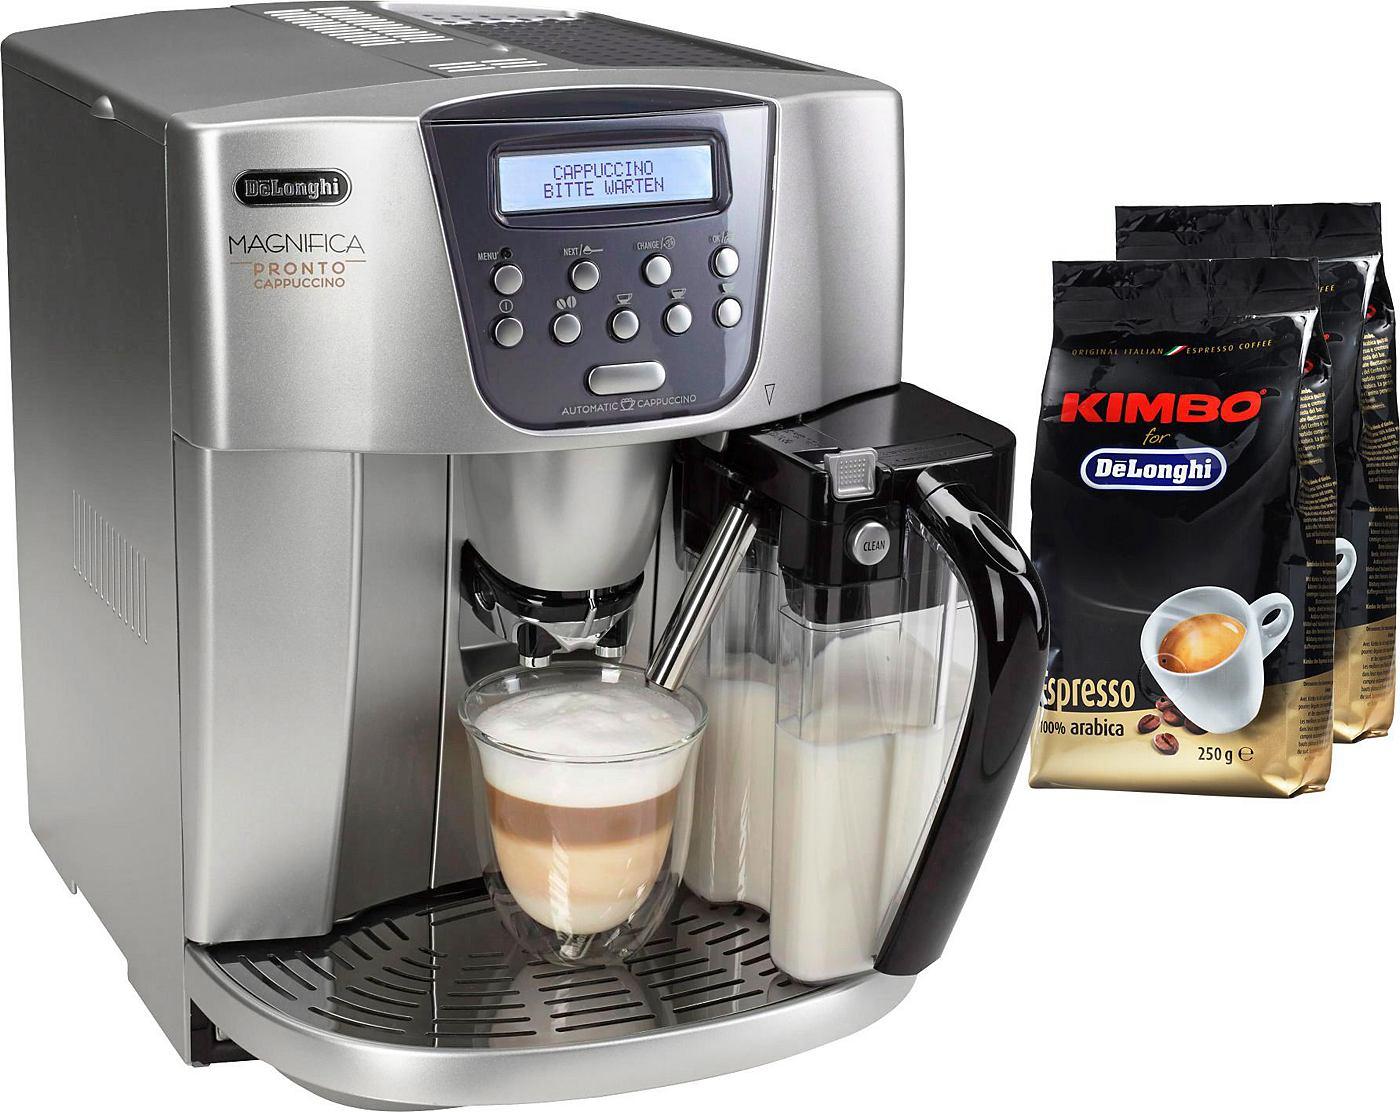 Delonghi volautomatisch koffiezetapparaat ESAM 5708.B, zwart